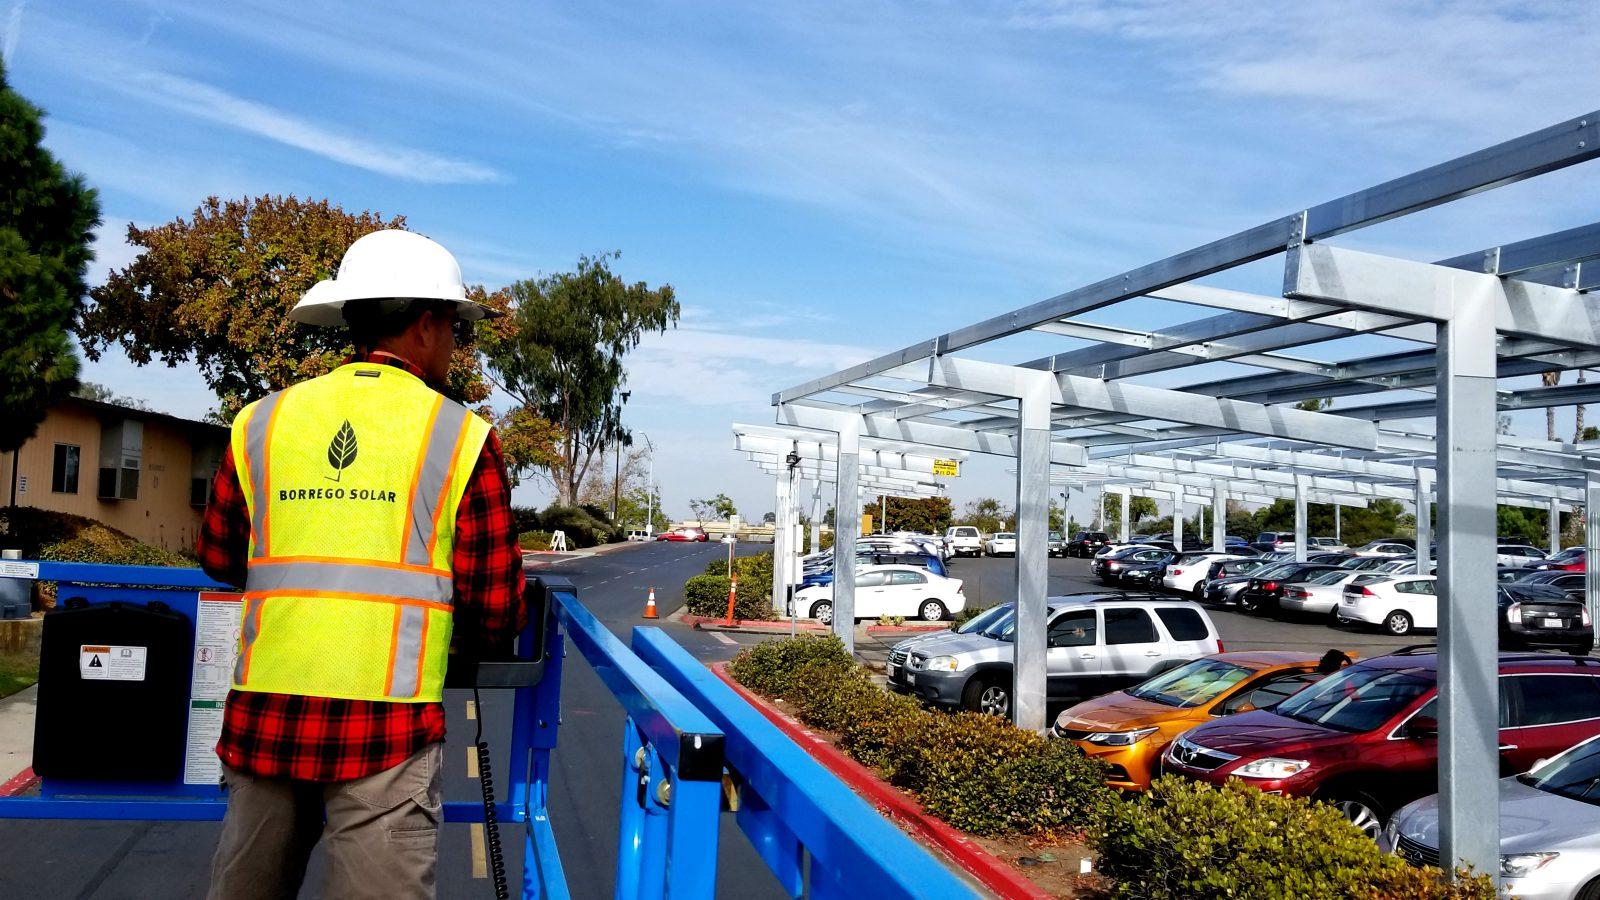 Borrego Solar Installing 1 MW Solar Project for San Diego County Office of Education